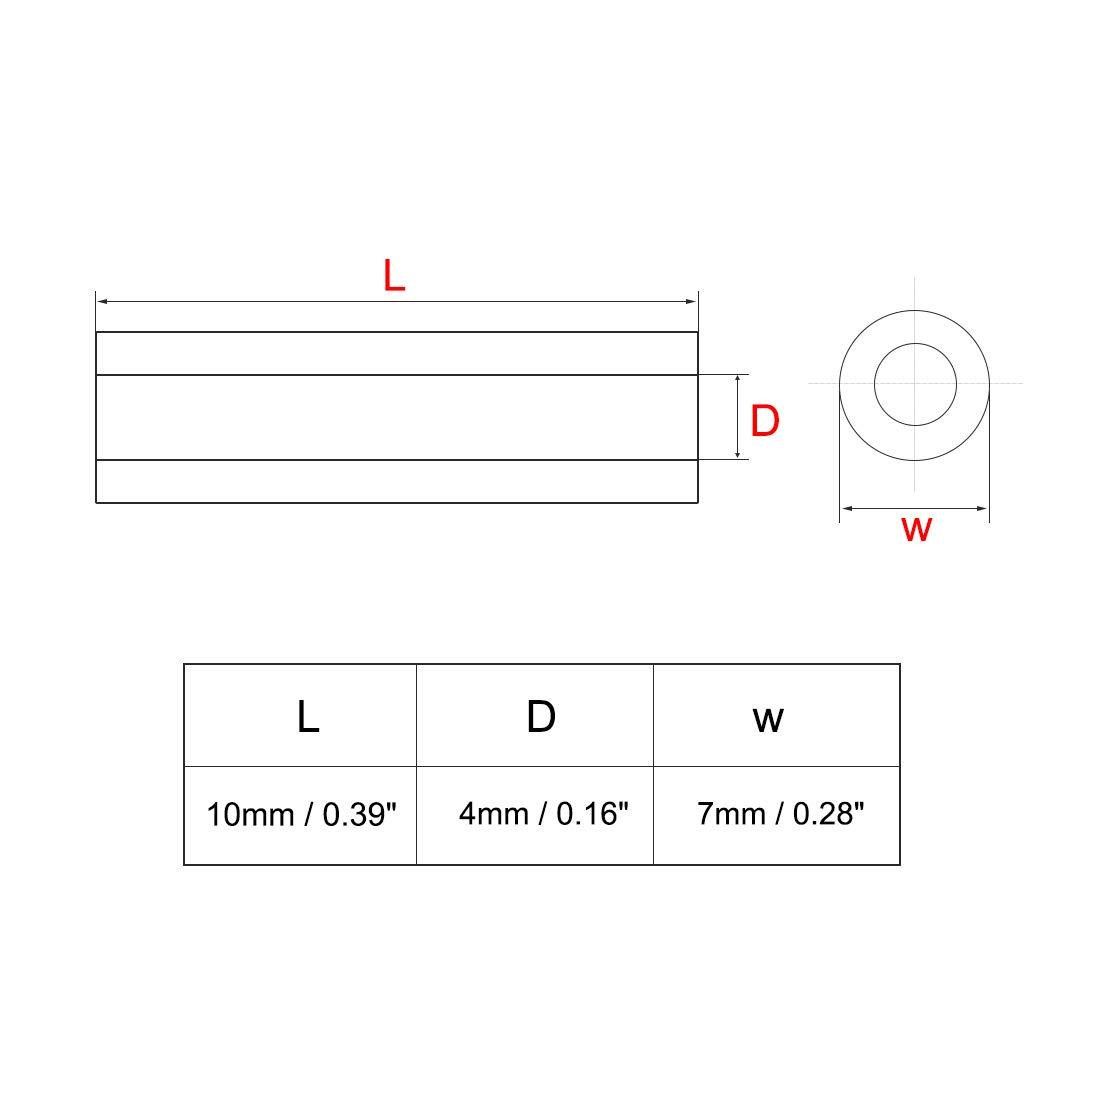 uxcell 140pcs 3x5x8mm Nylon Straight Insulating Tube PCB Pillar Standoff Spacer a18072700ux0484